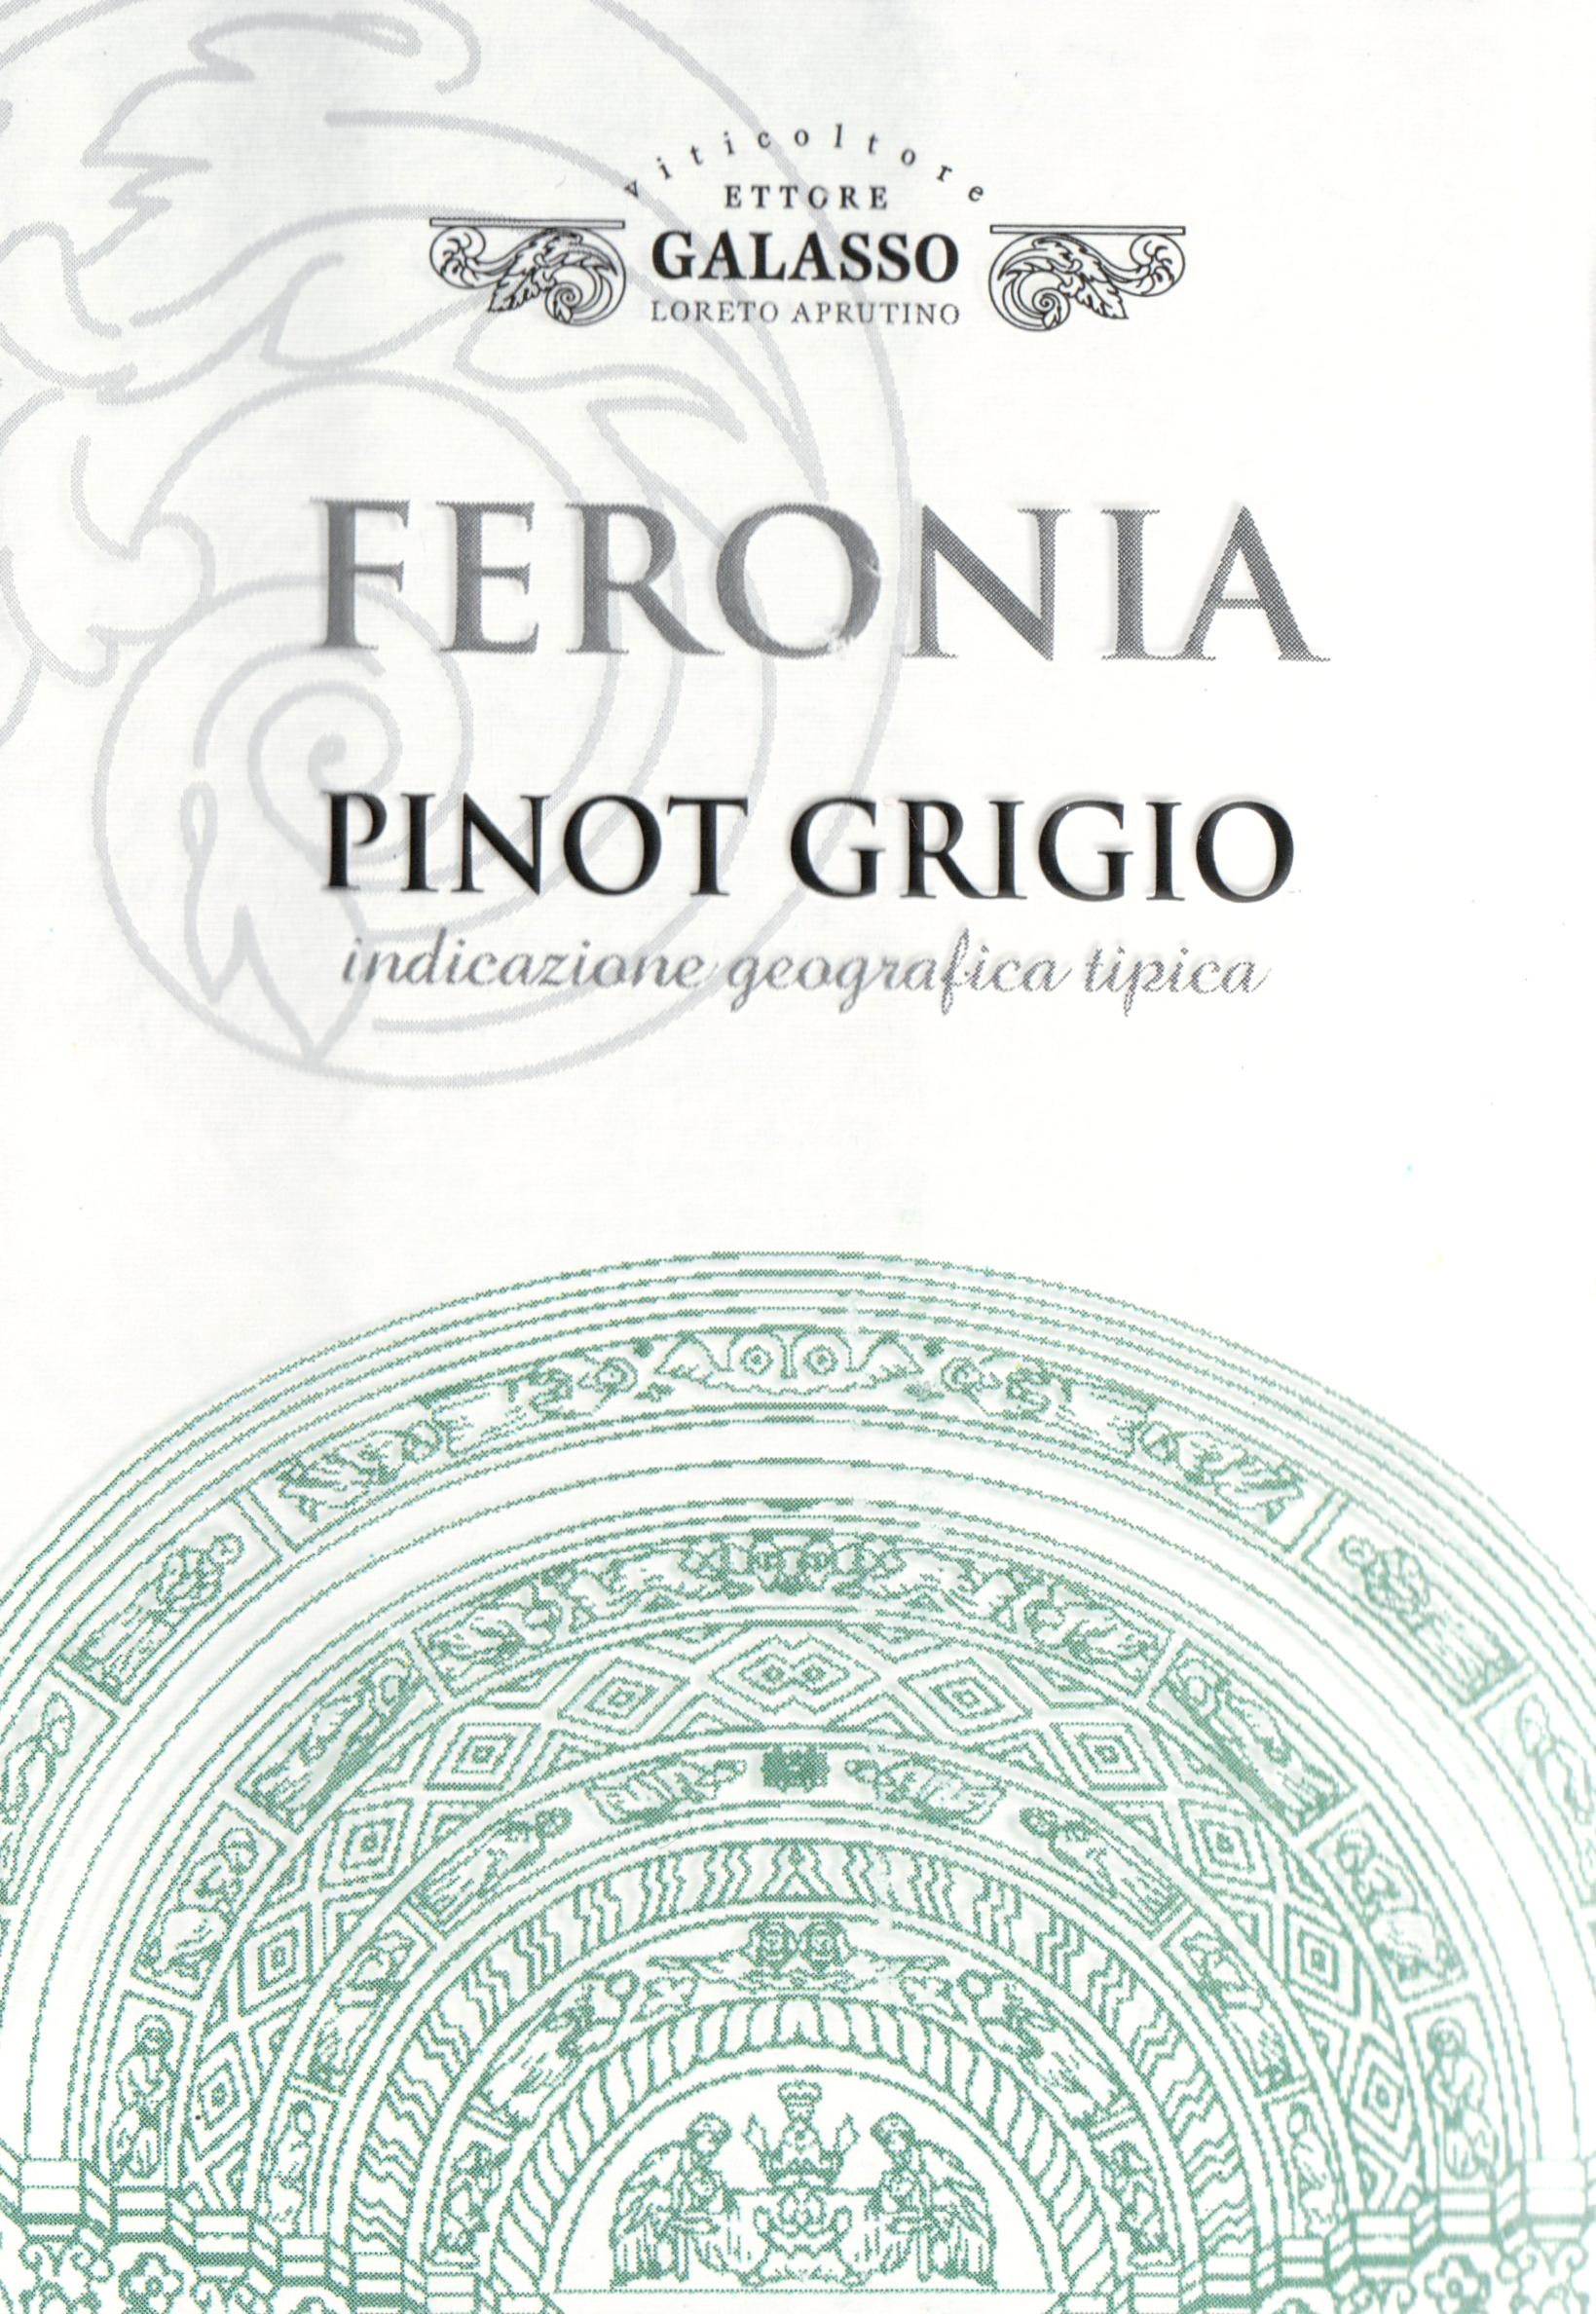 Feronia Pinot Grigio 2018